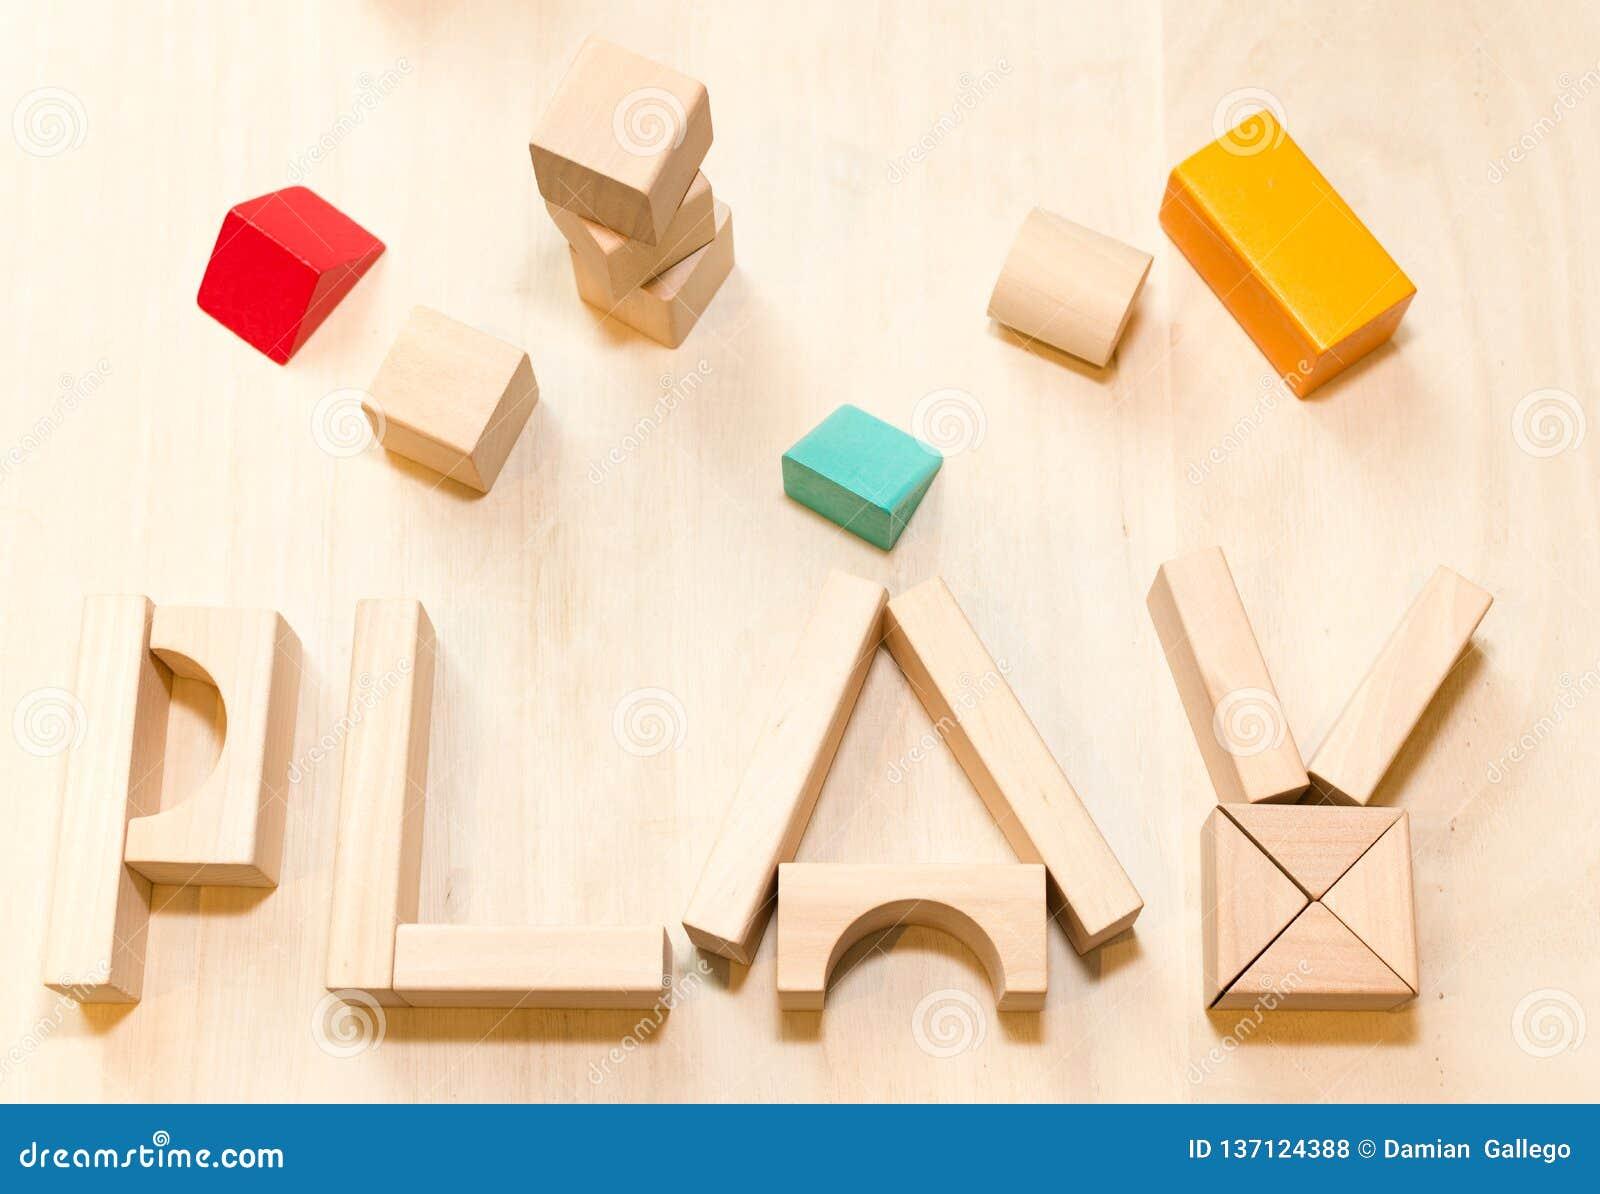 Child or baby play set, toy wooden blocks. Kindergarten or preschool background